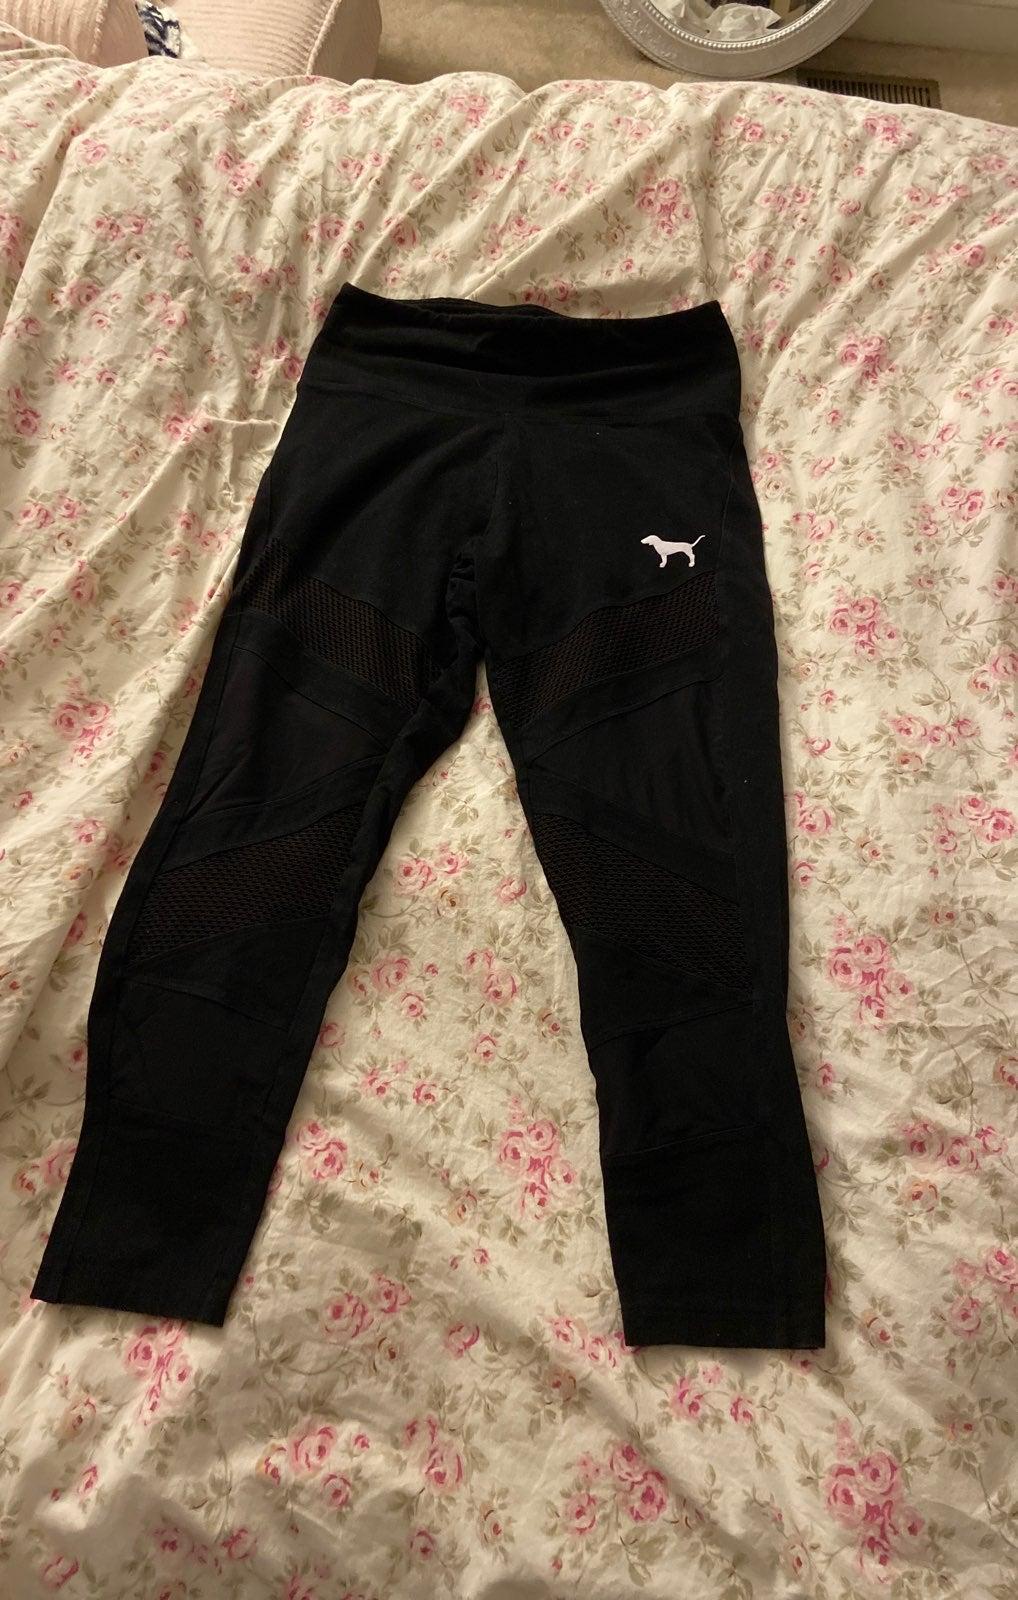 Pink Victoria's Secret mesh leggings